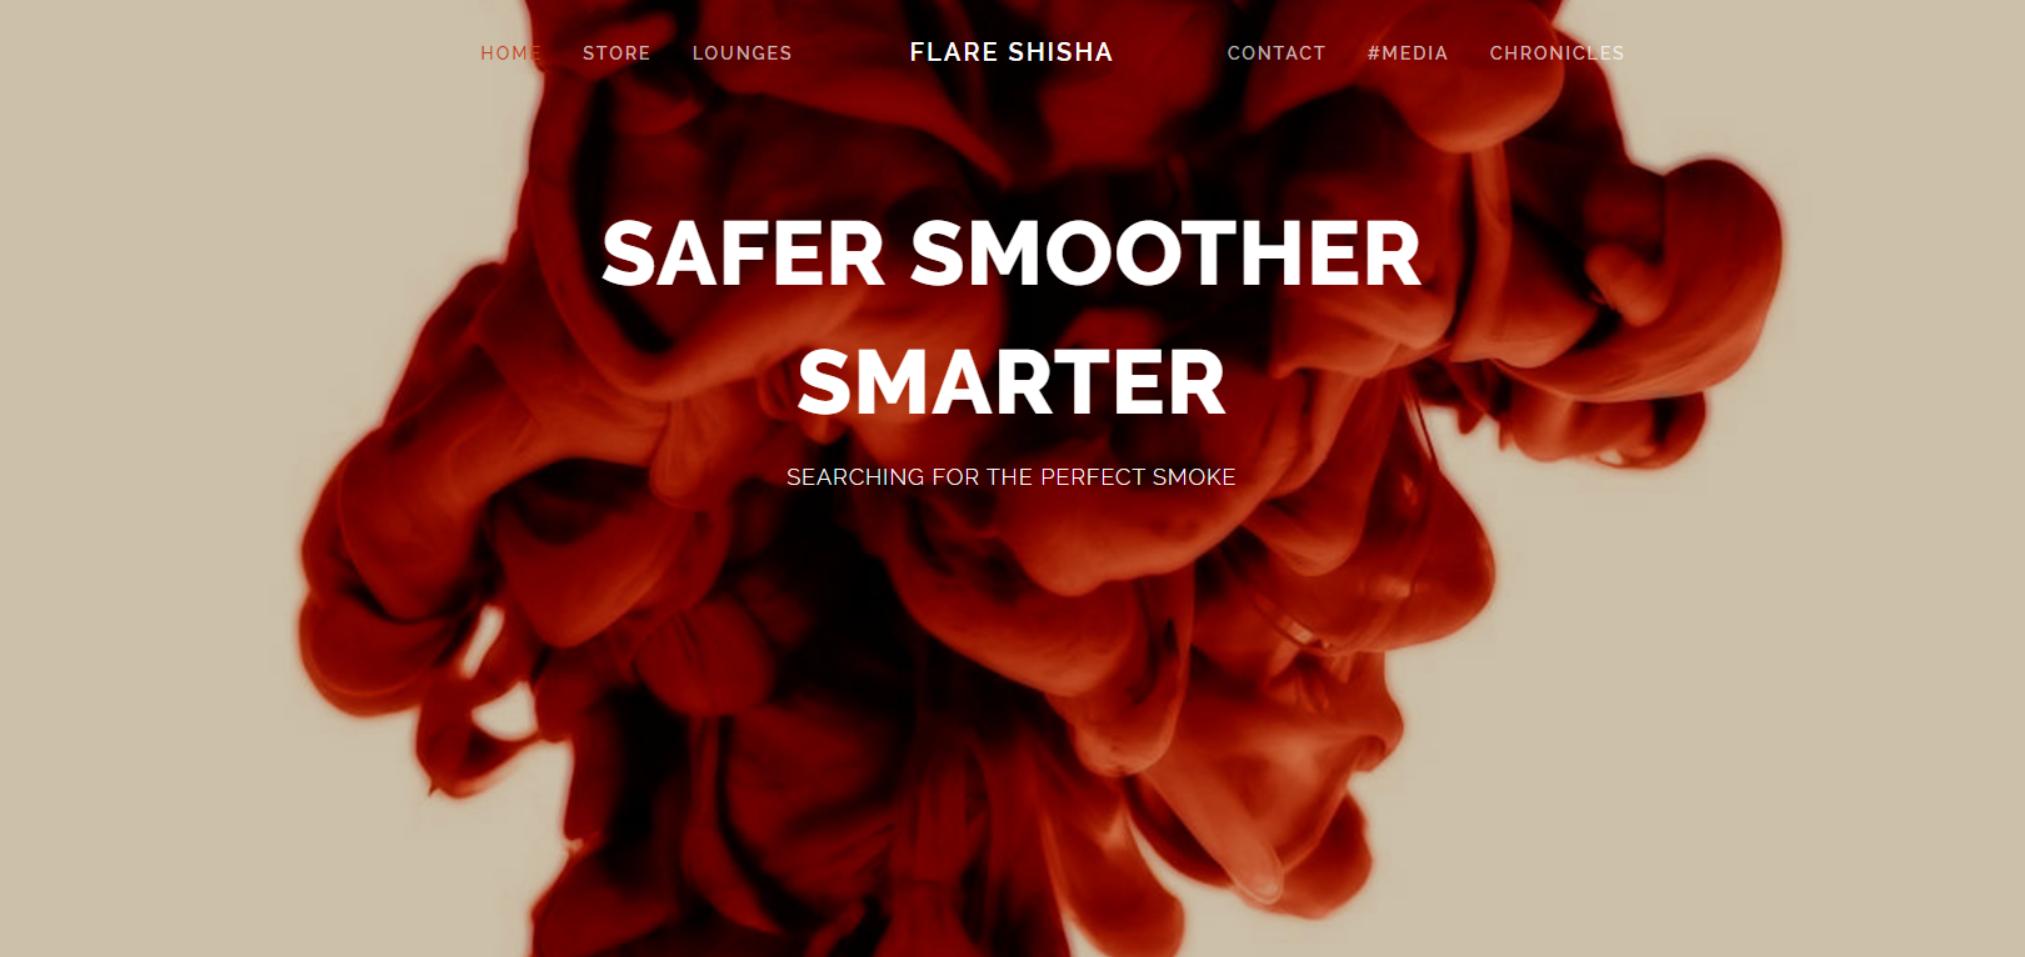 flareshisha.com